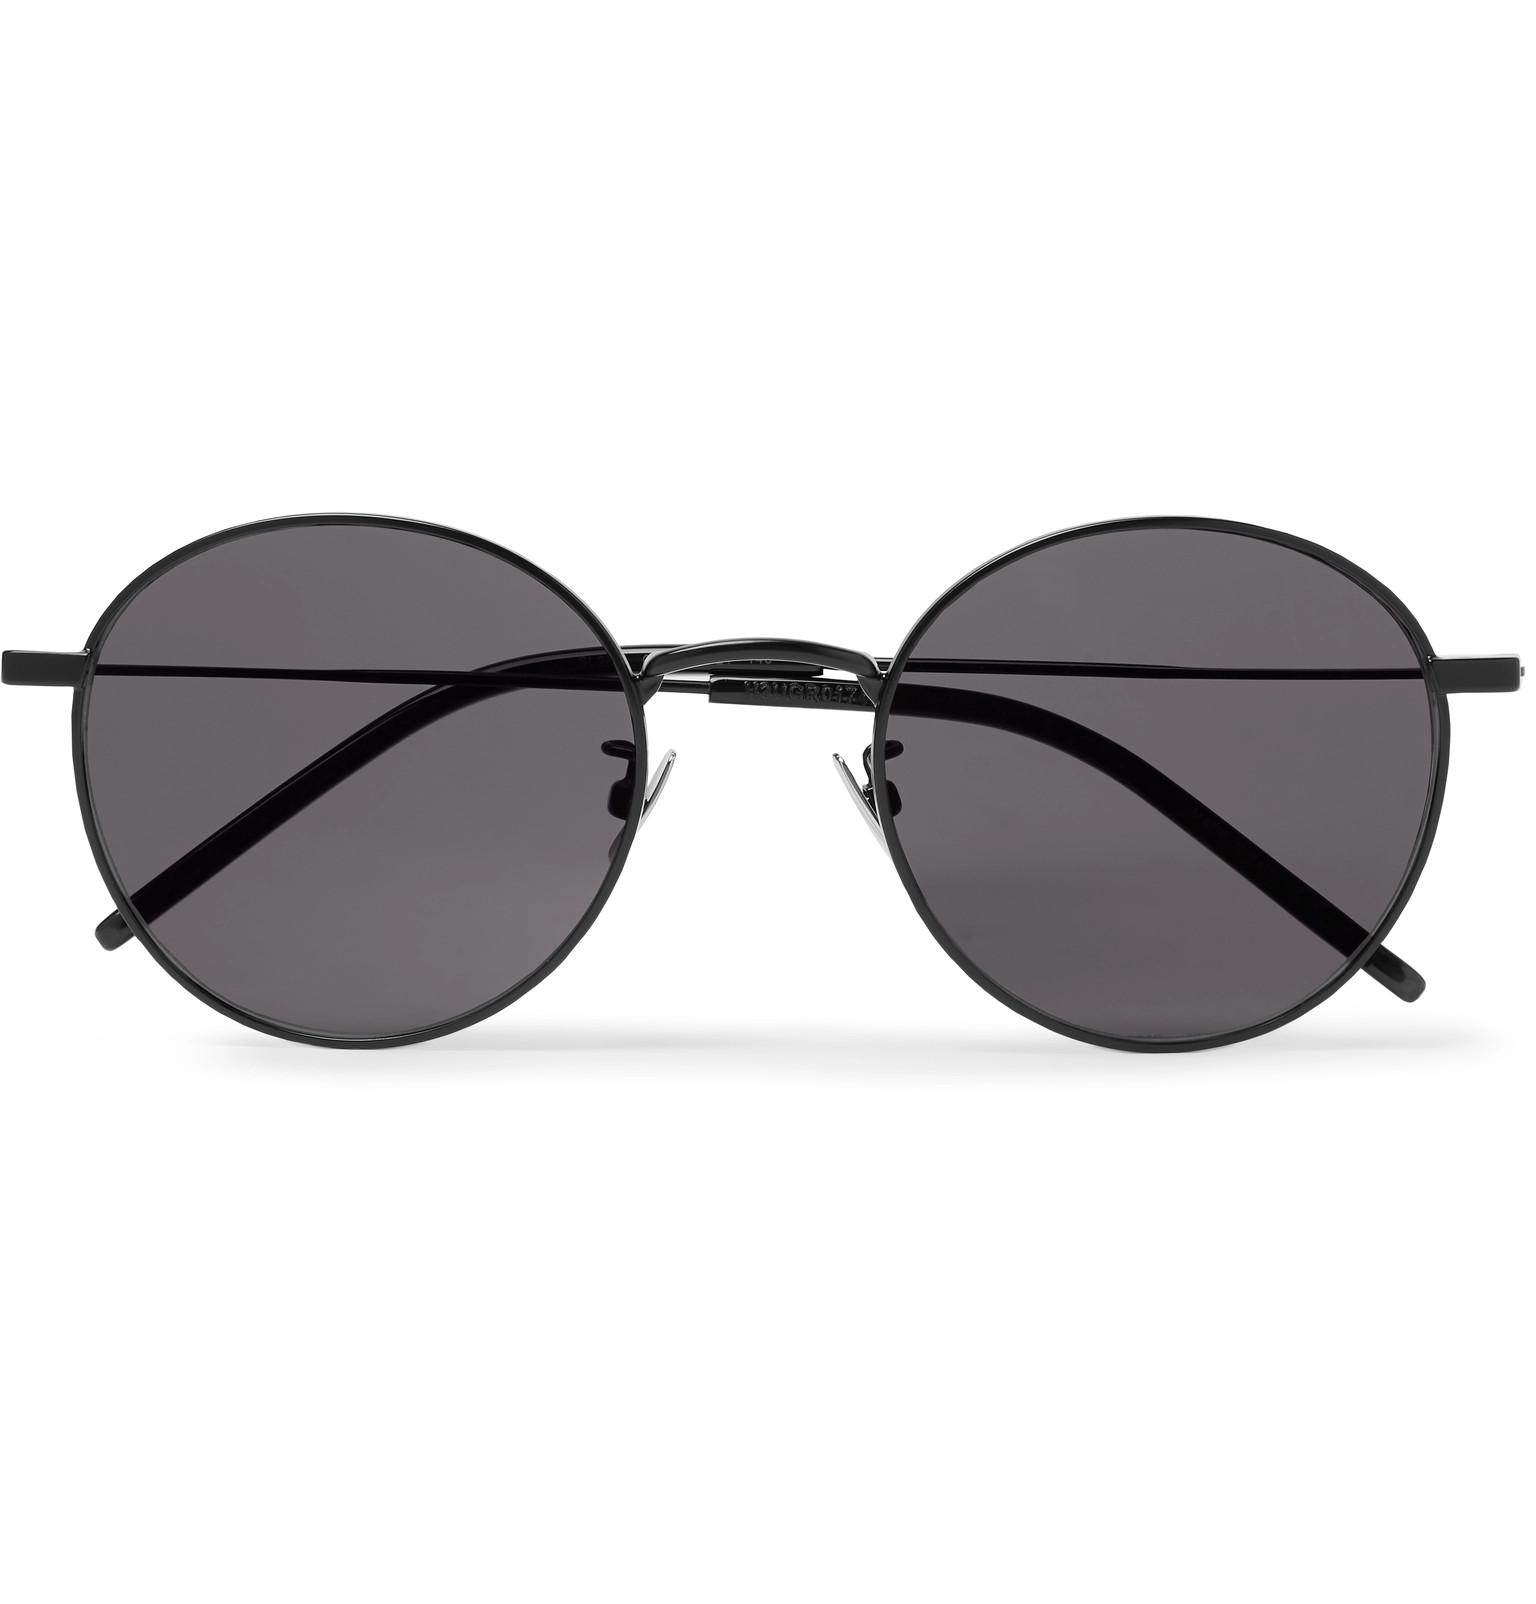 e270f192fa05 Saint Laurent Round-frame Metal Sunglasses in Black for Men - Lyst